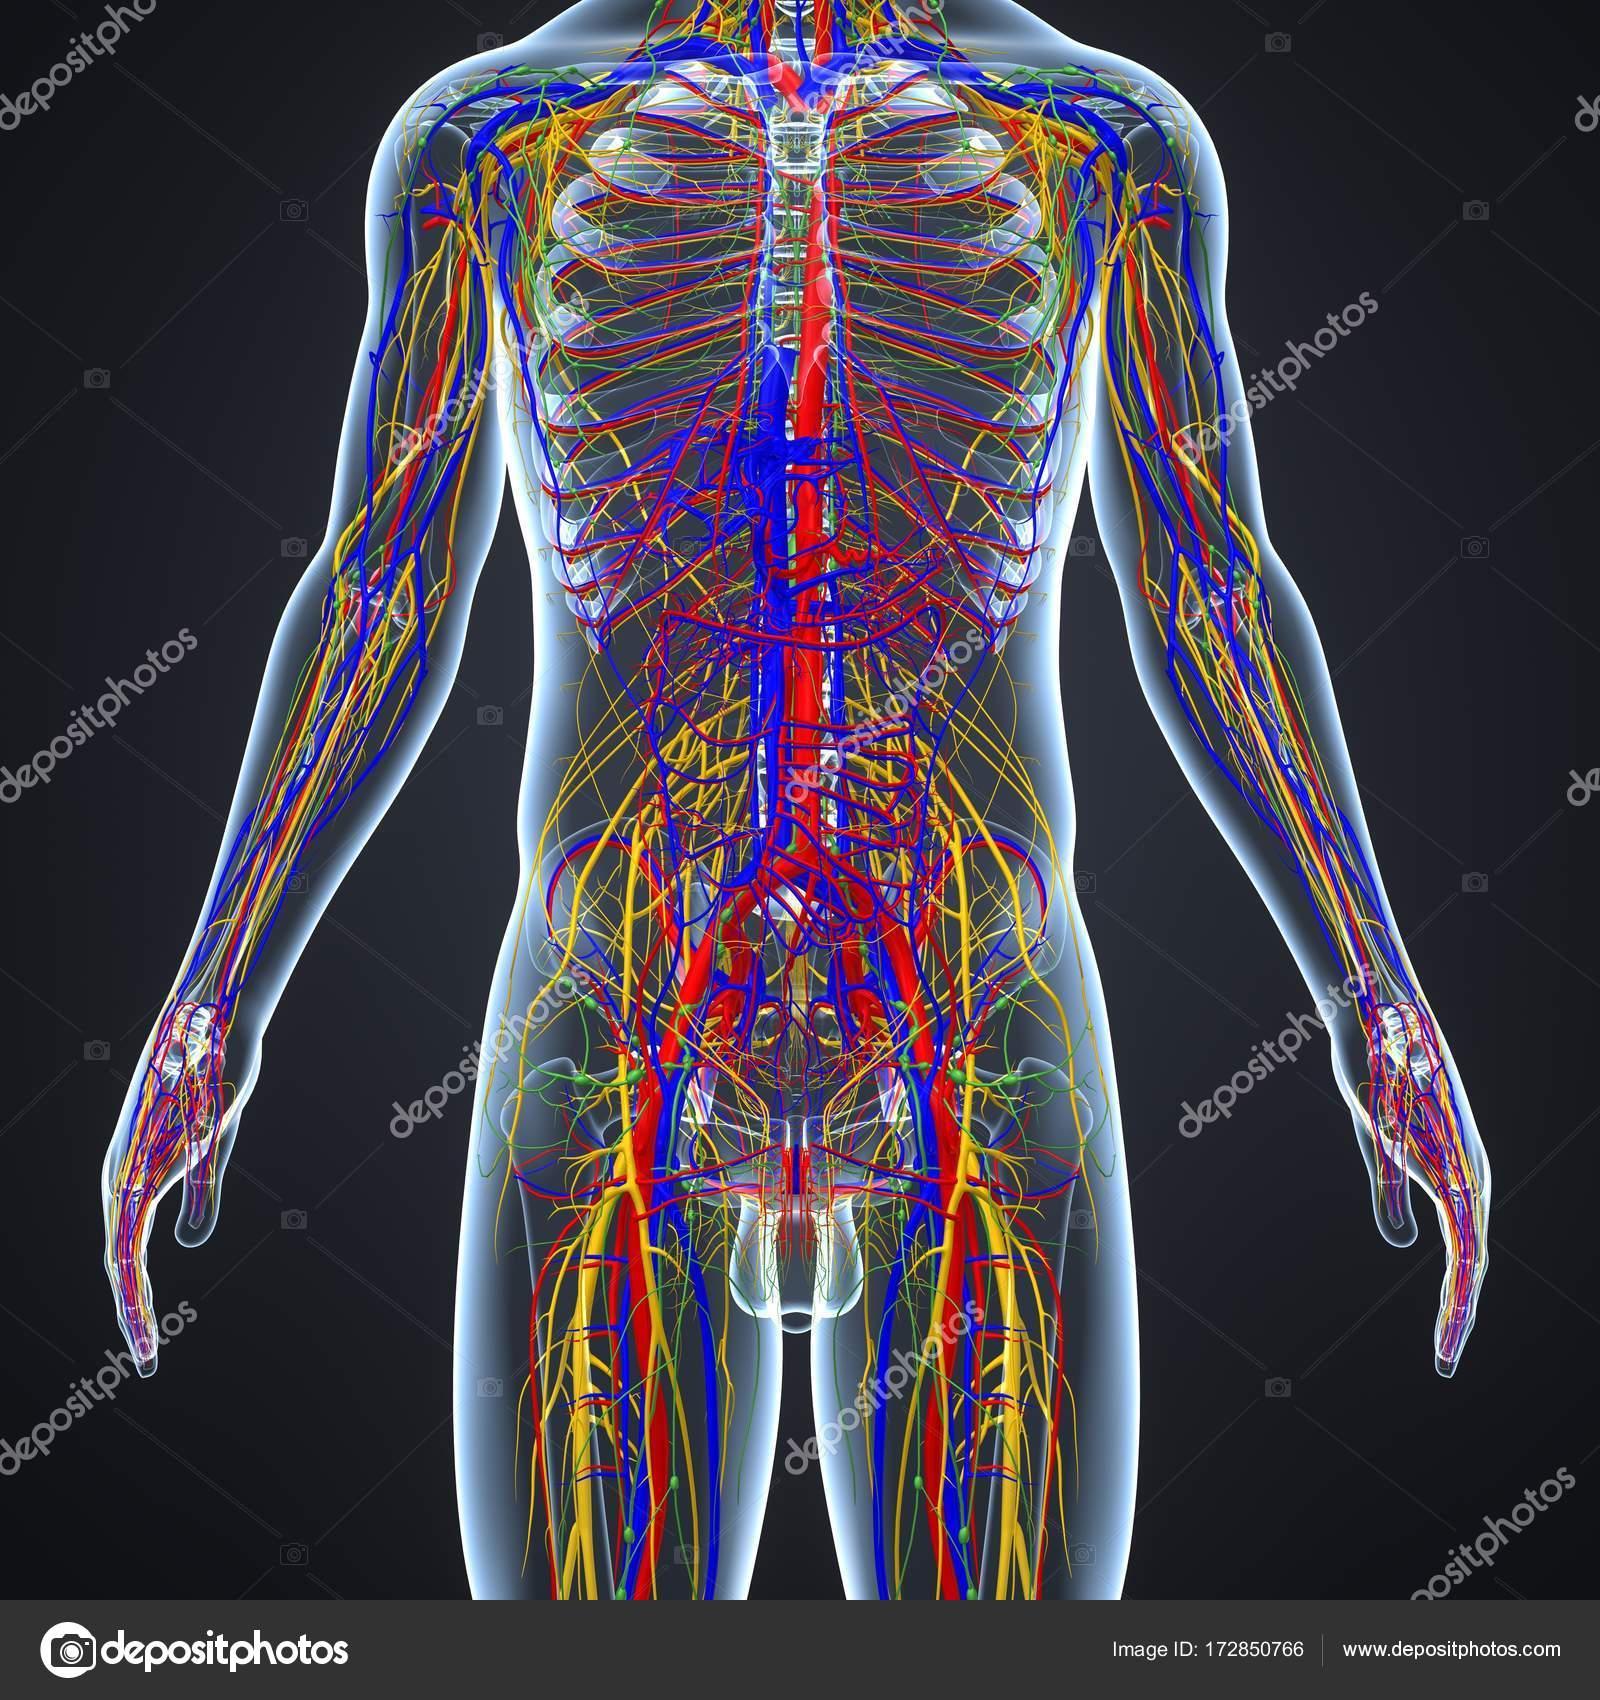 Nervensystem mit Lymphknoten — Stockfoto © sciencepics #172850766